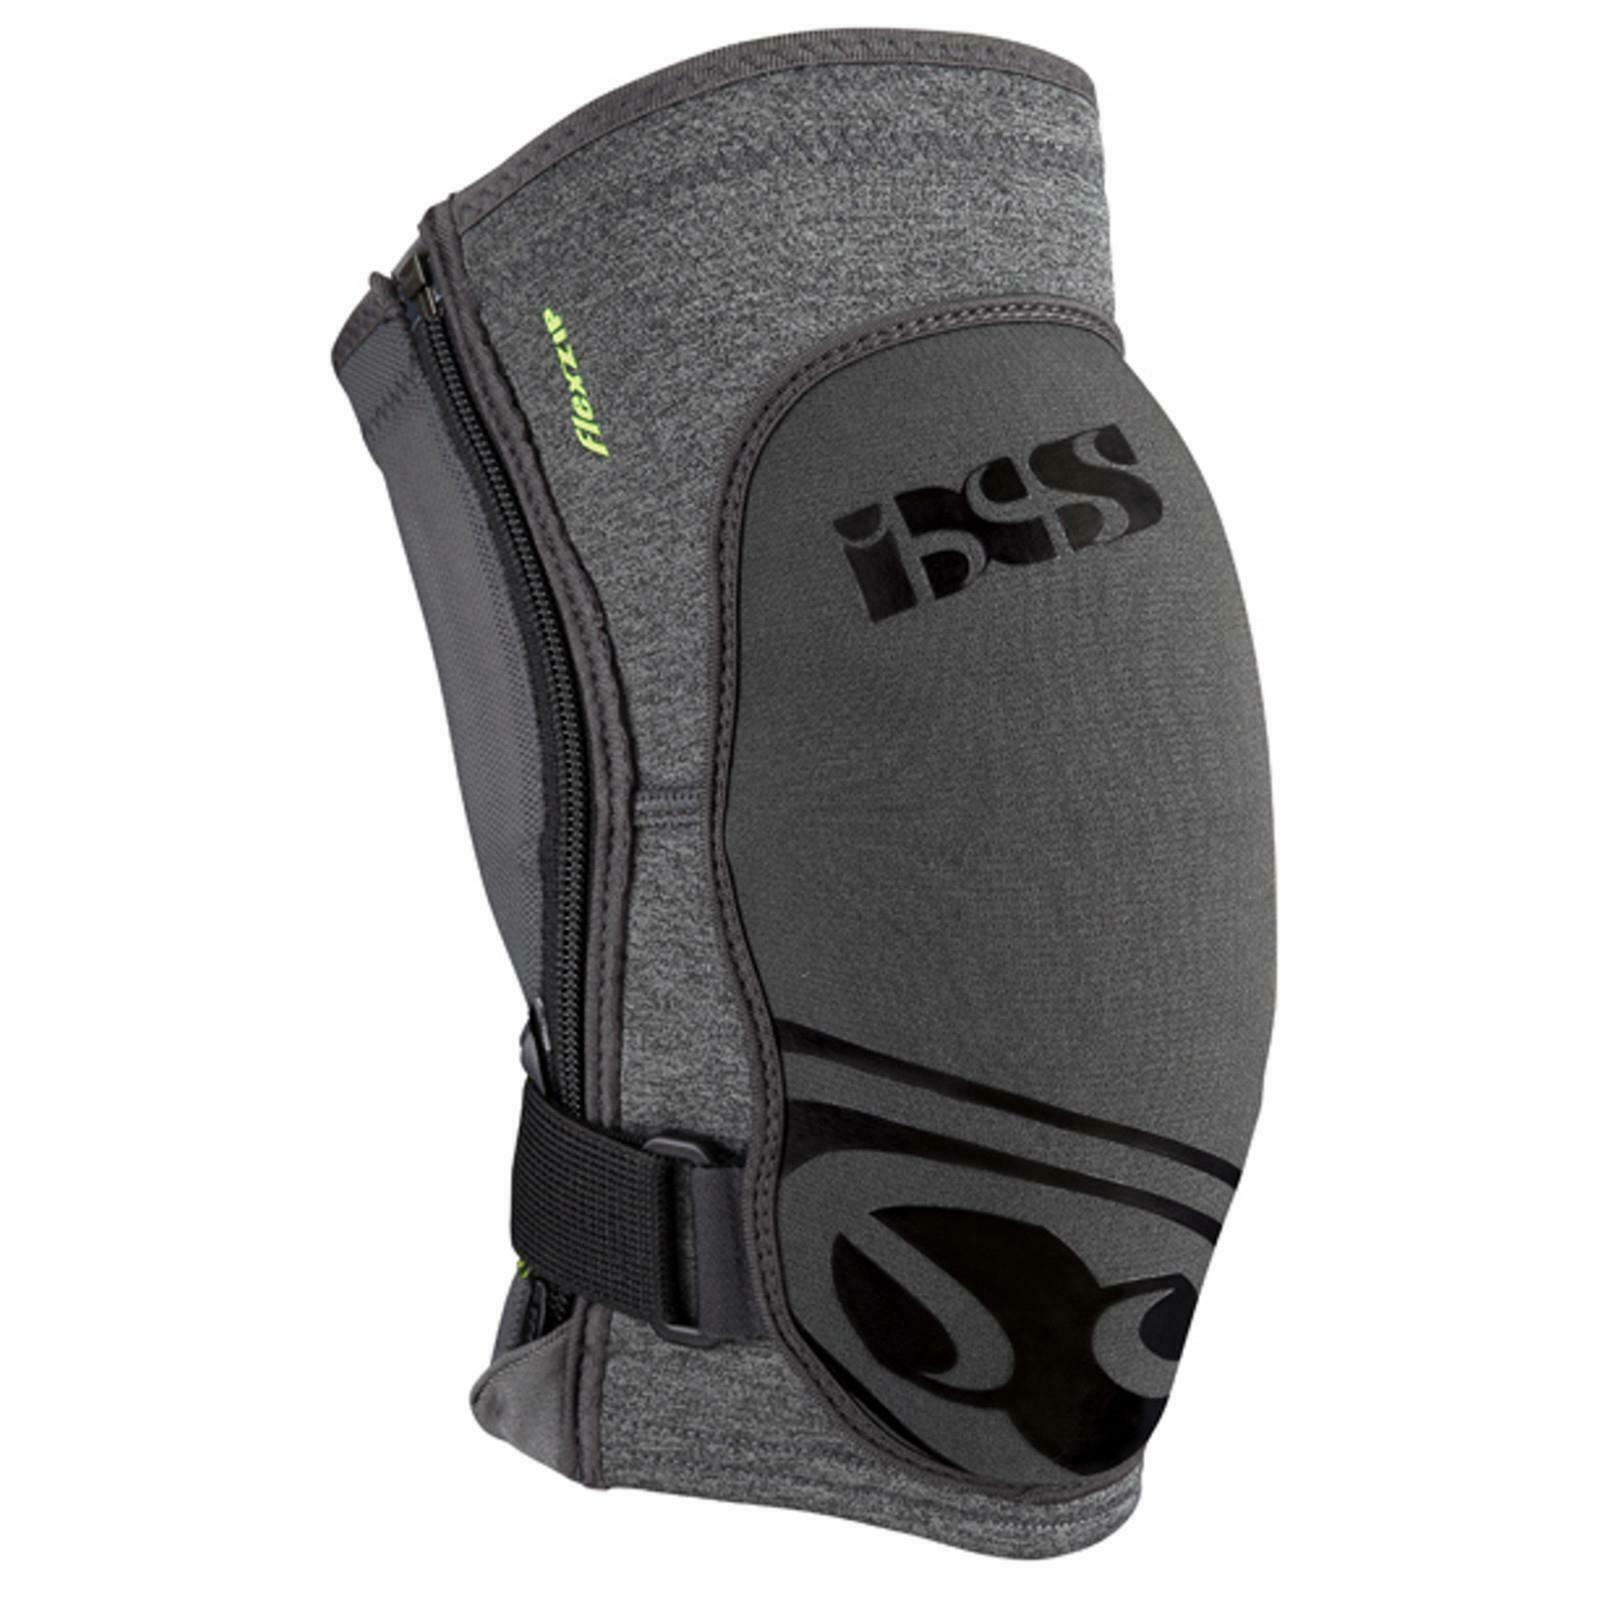 IXS Flow Zip Knee Pads Predector MTB DH FR MX  Downhill Enduro Mountain Bike  discount sale